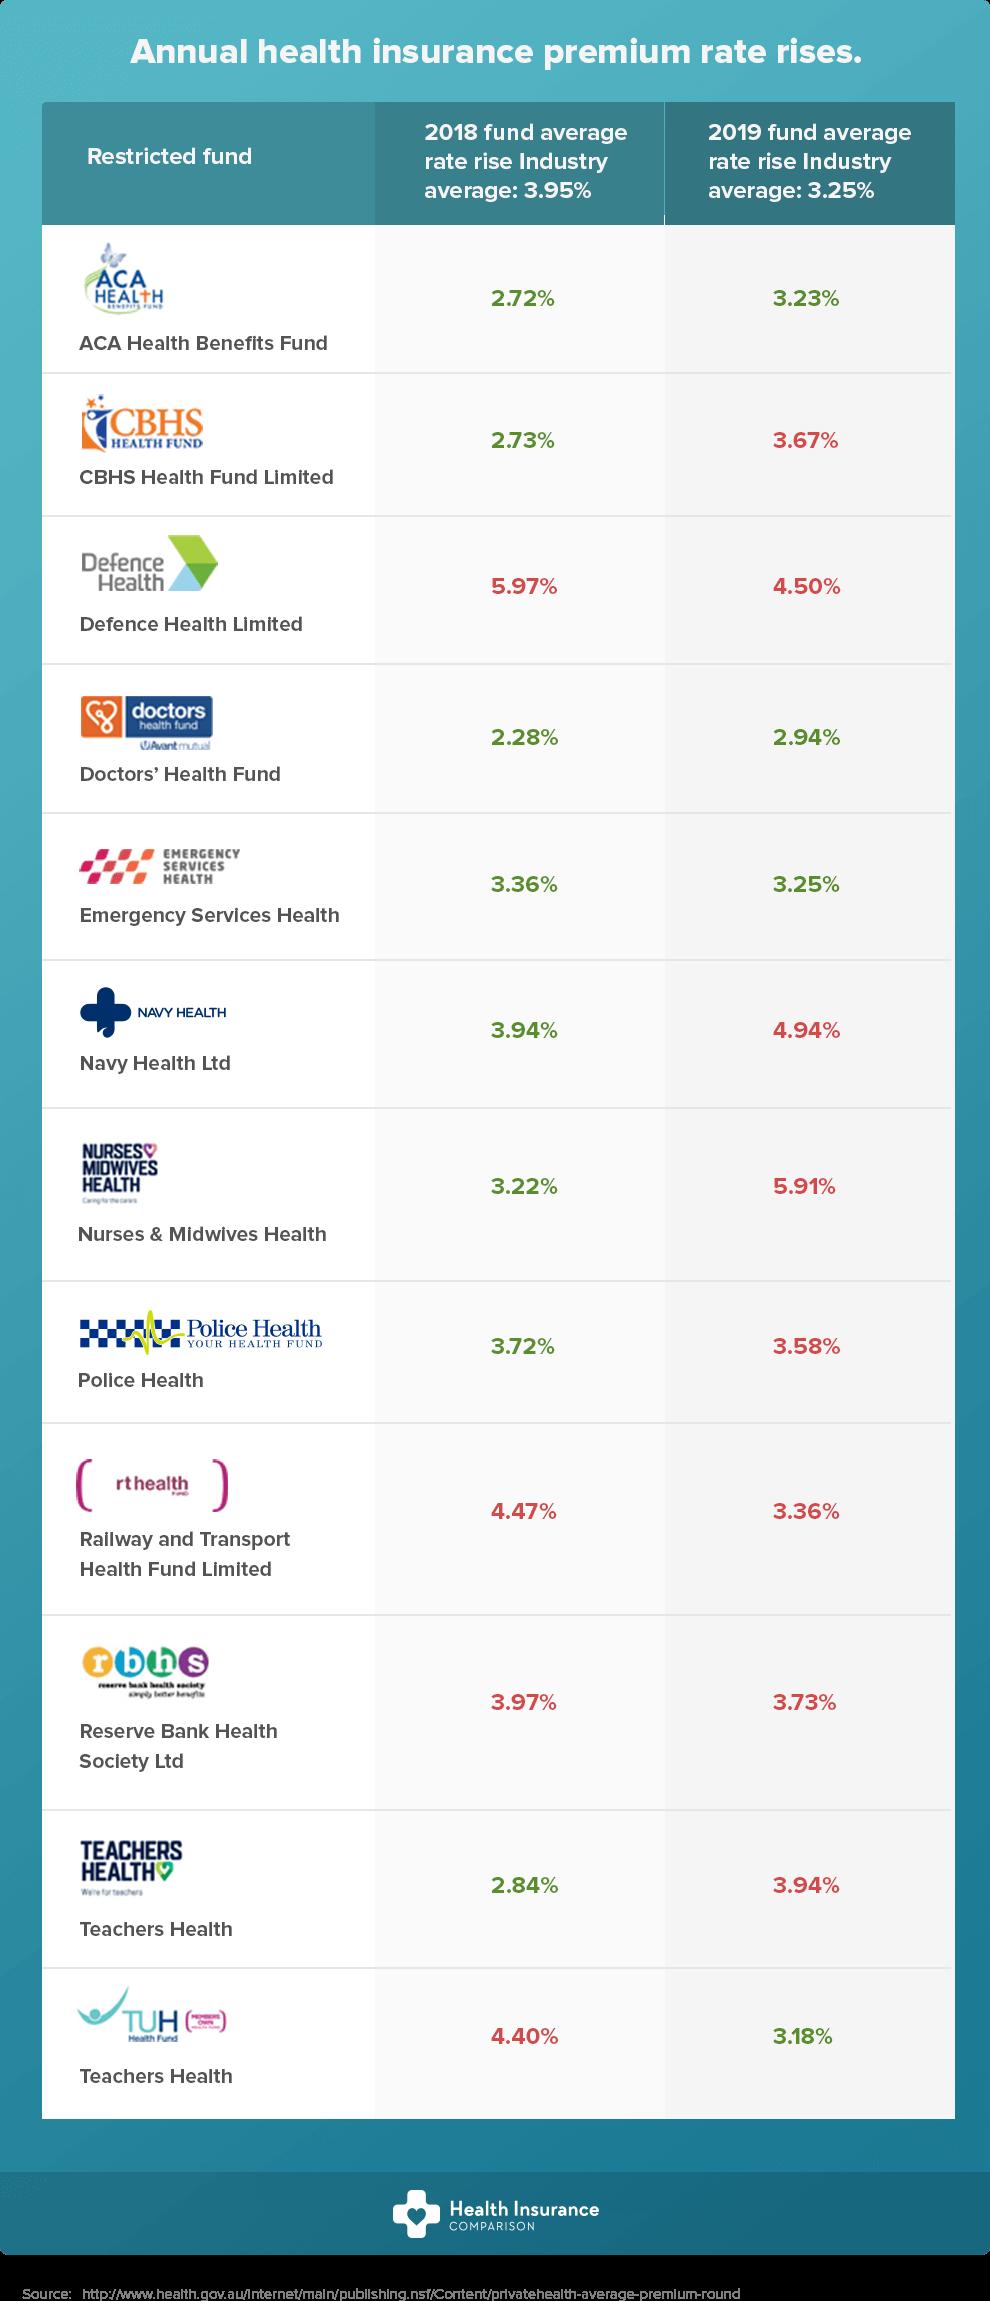 Annual health insurance premium rate rises